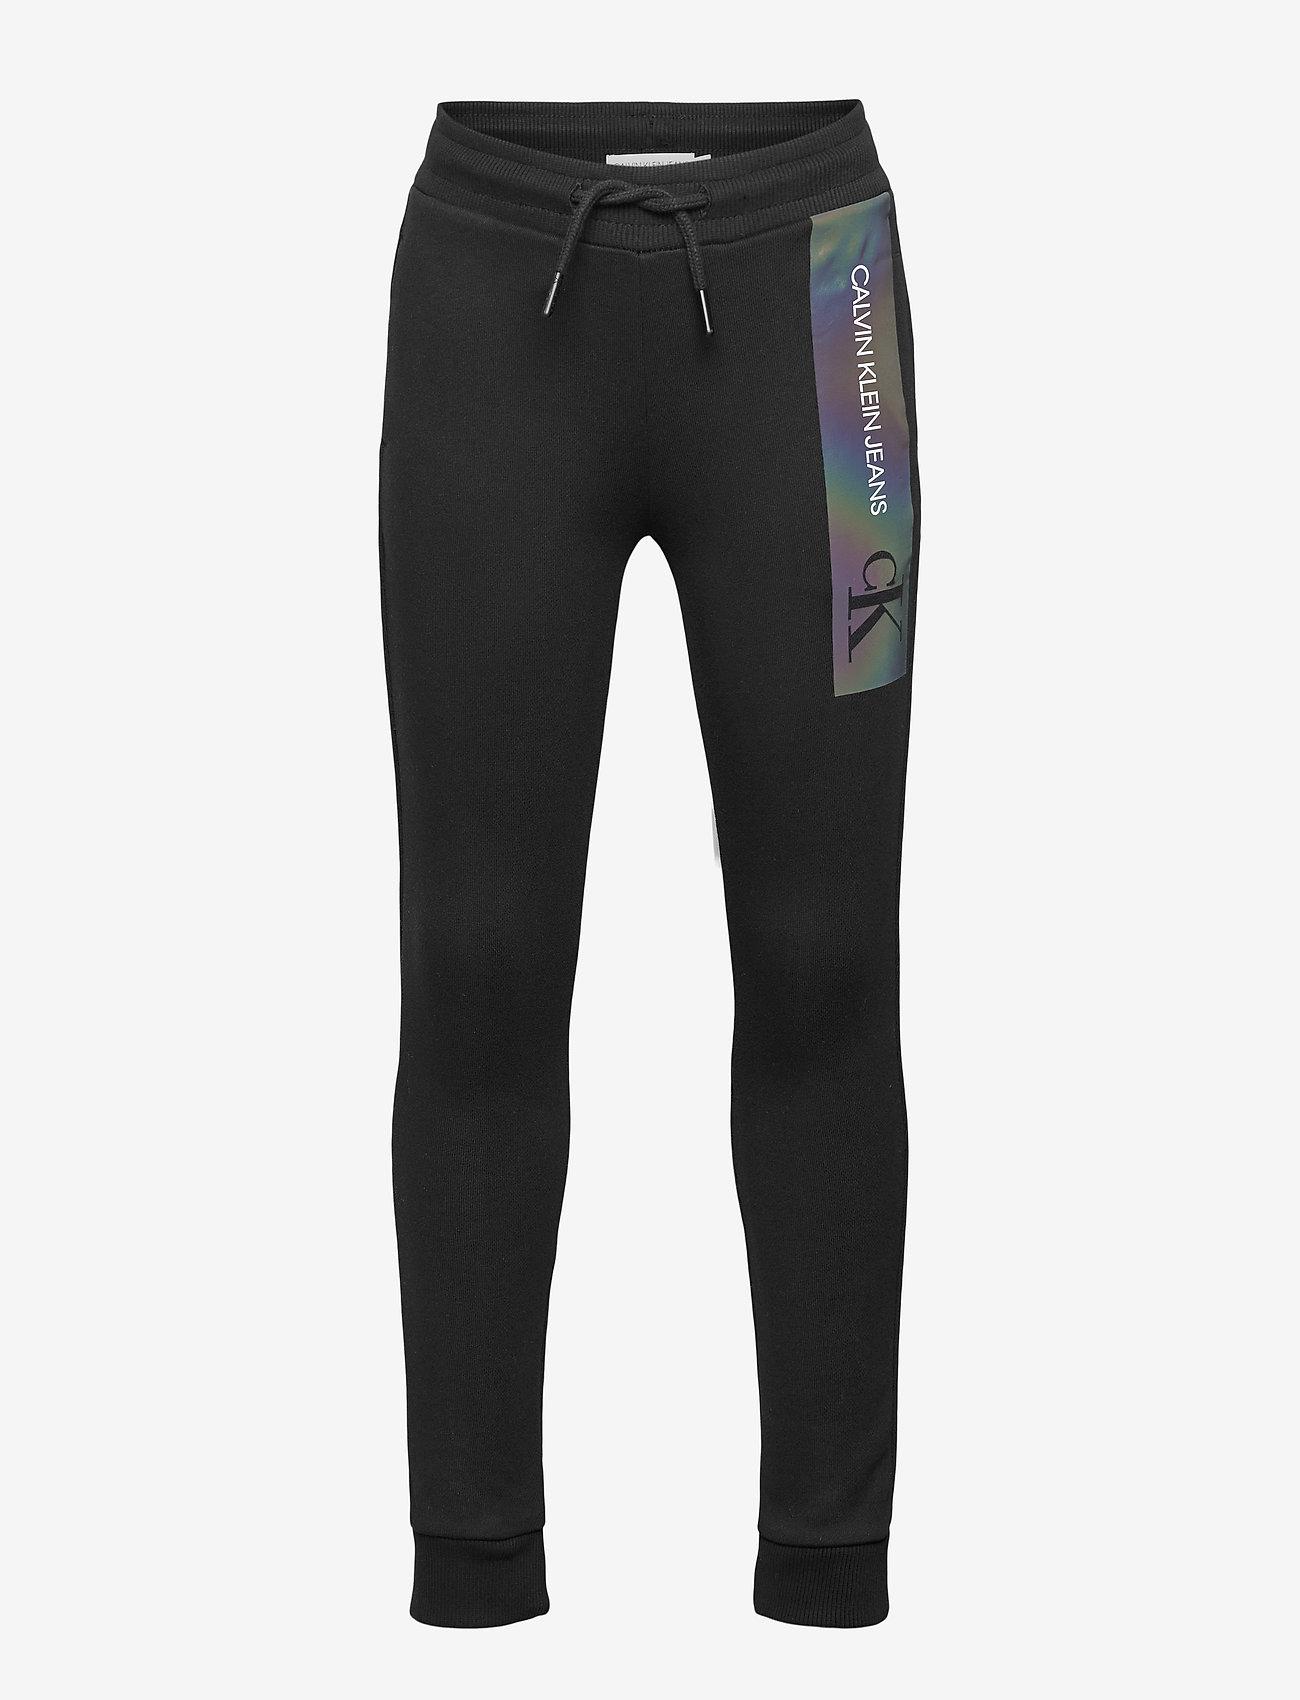 Calvin Klein - REFLECTIVE LOGO SLIM FIT PANTS - jogginghosen - ck black - 0